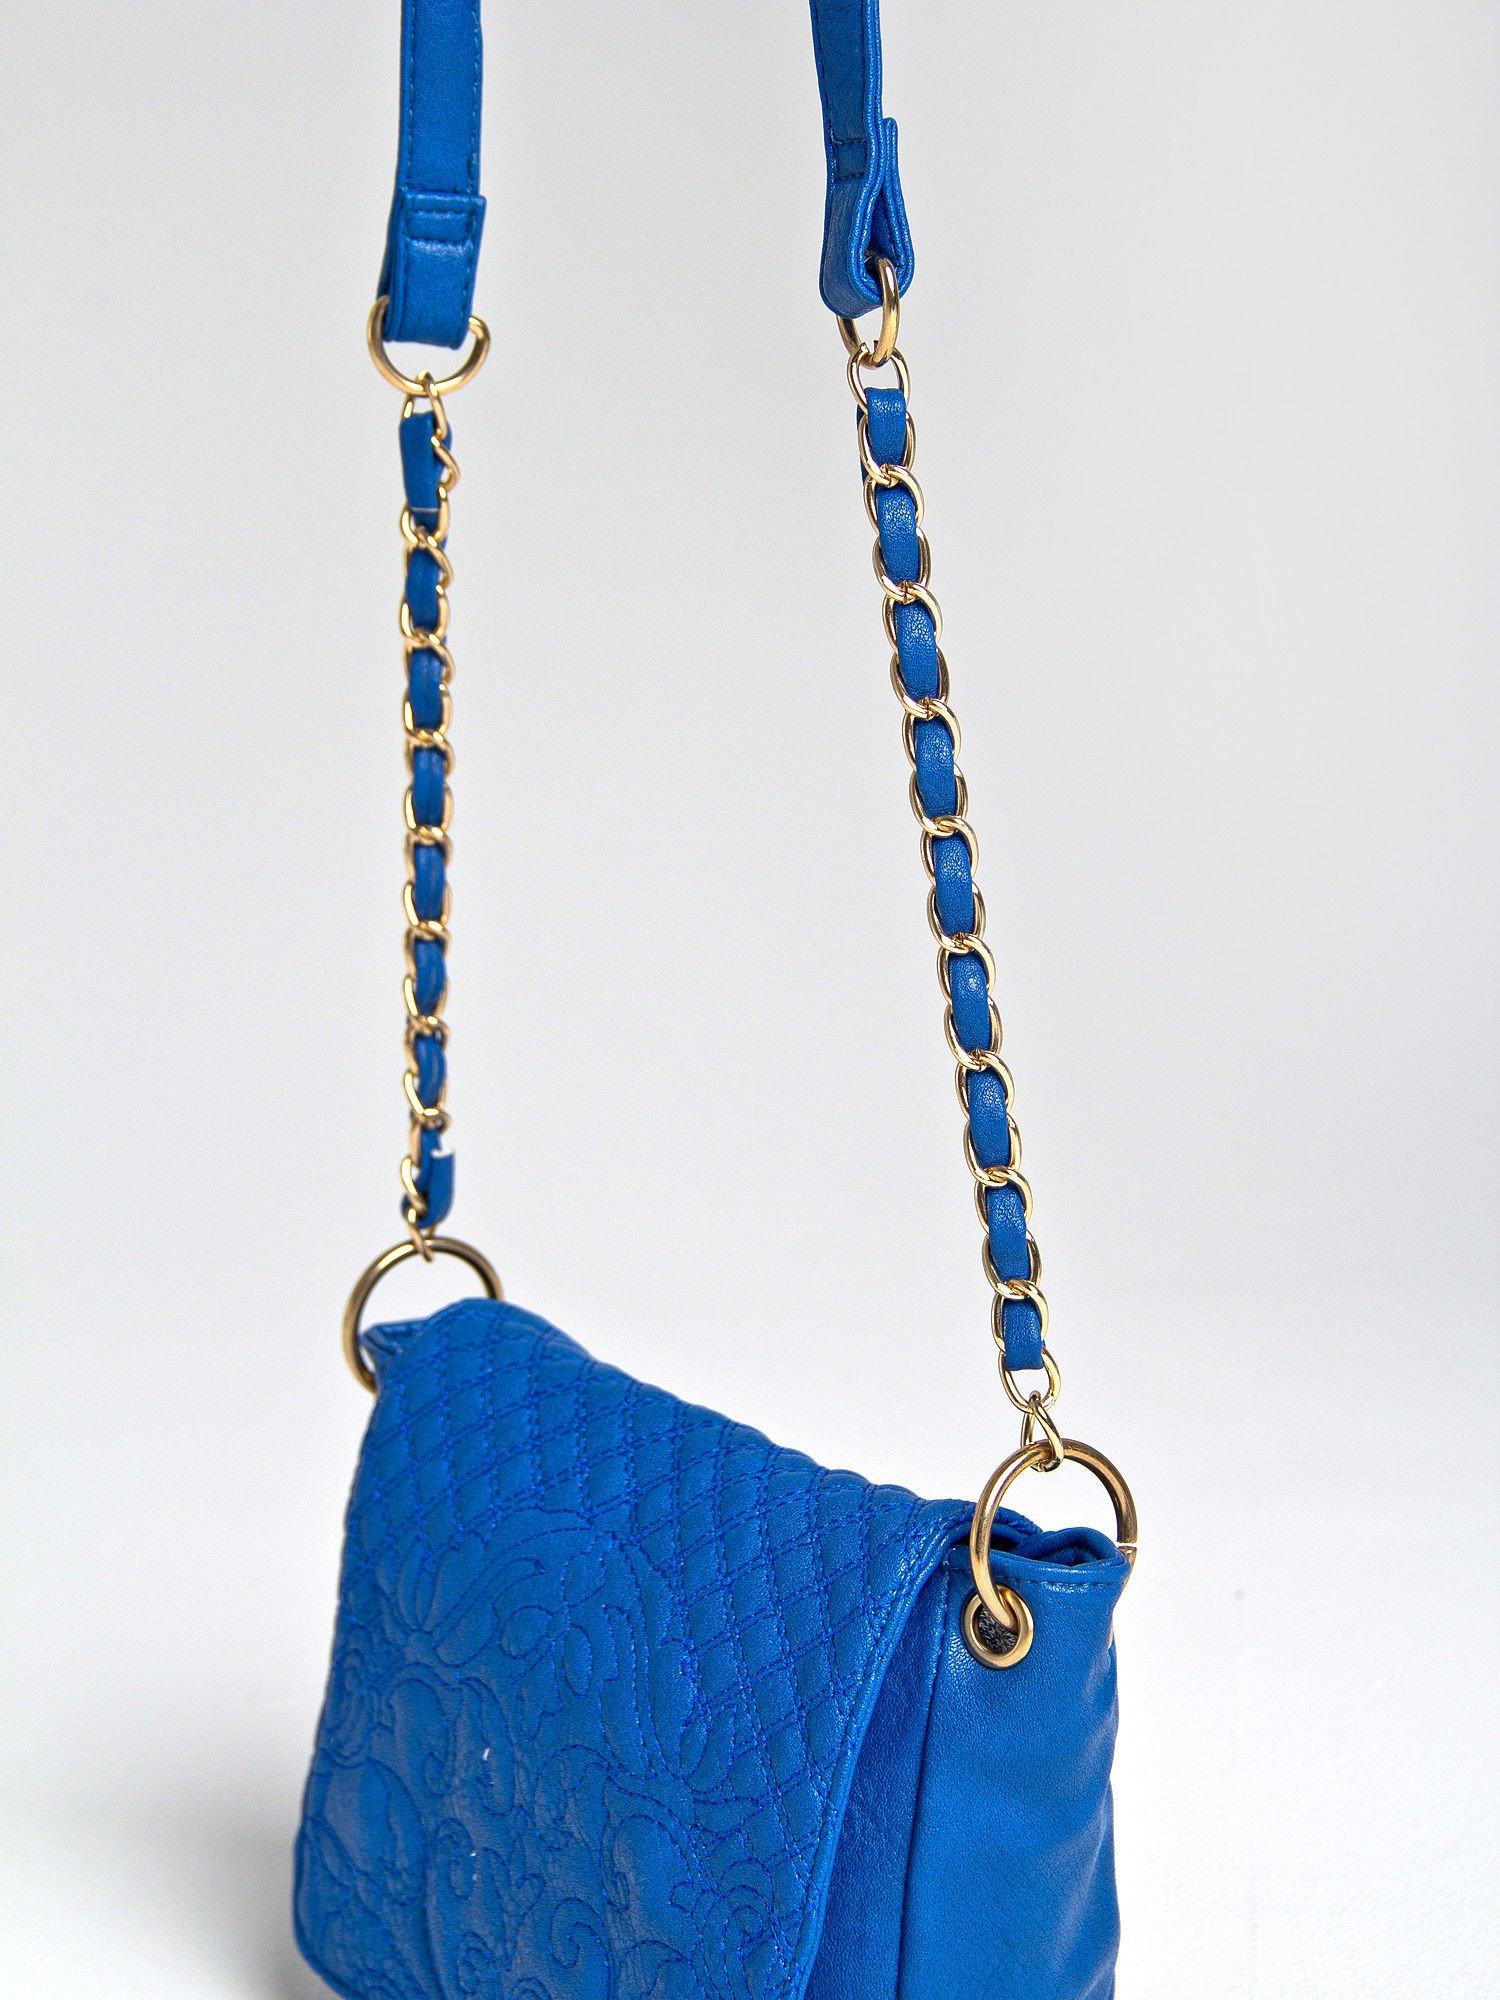 Niebieska torebka na ramię na pasku łańcuszku                                  zdj.                                  2